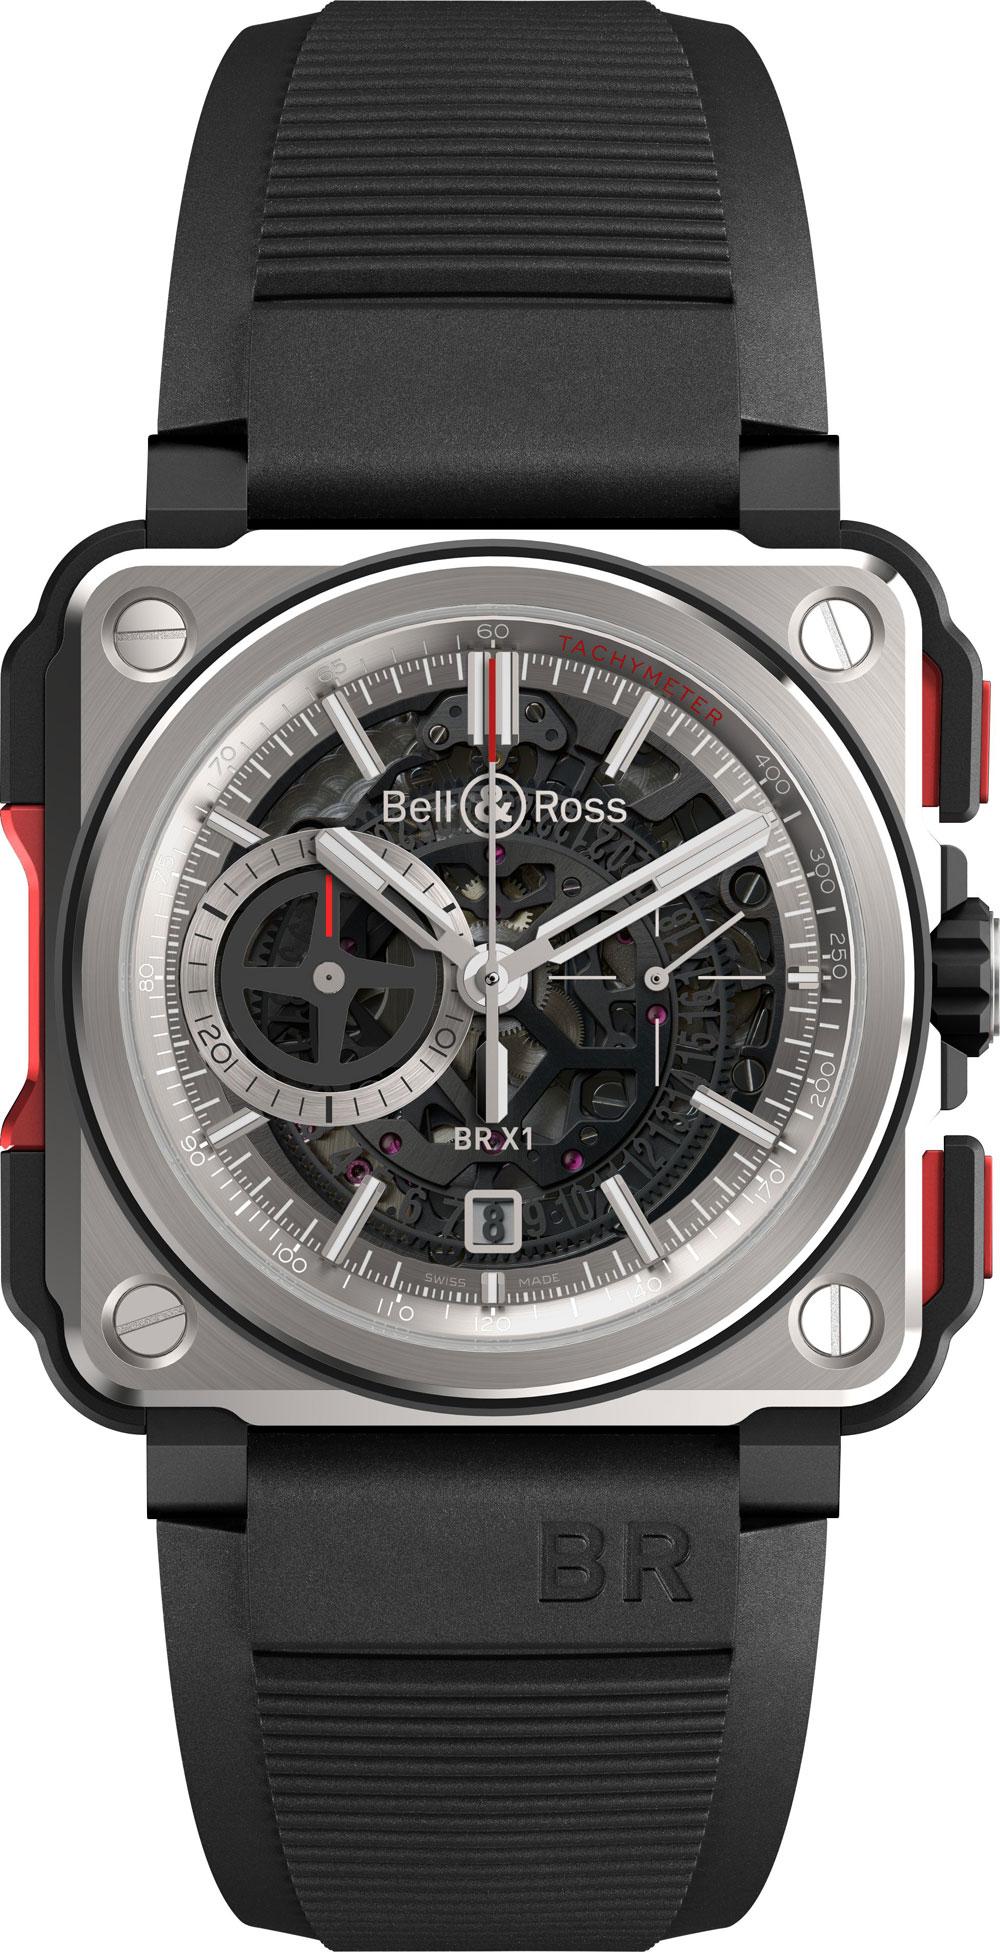 Primer reloj Bell & Ross colección BR-X1